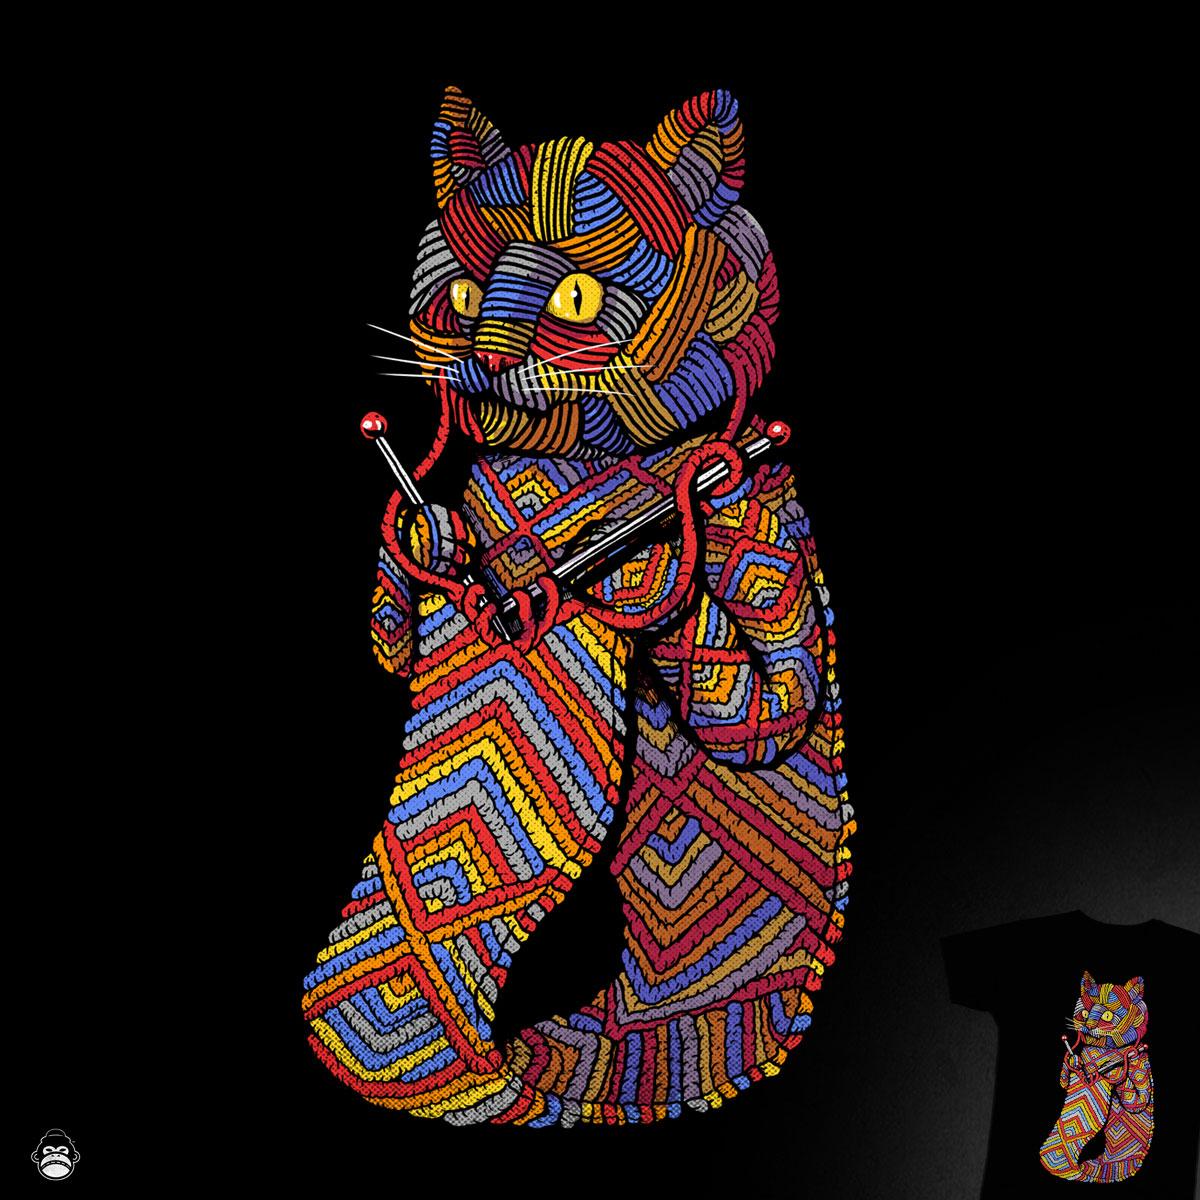 Knitty by alexmdc on Threadless